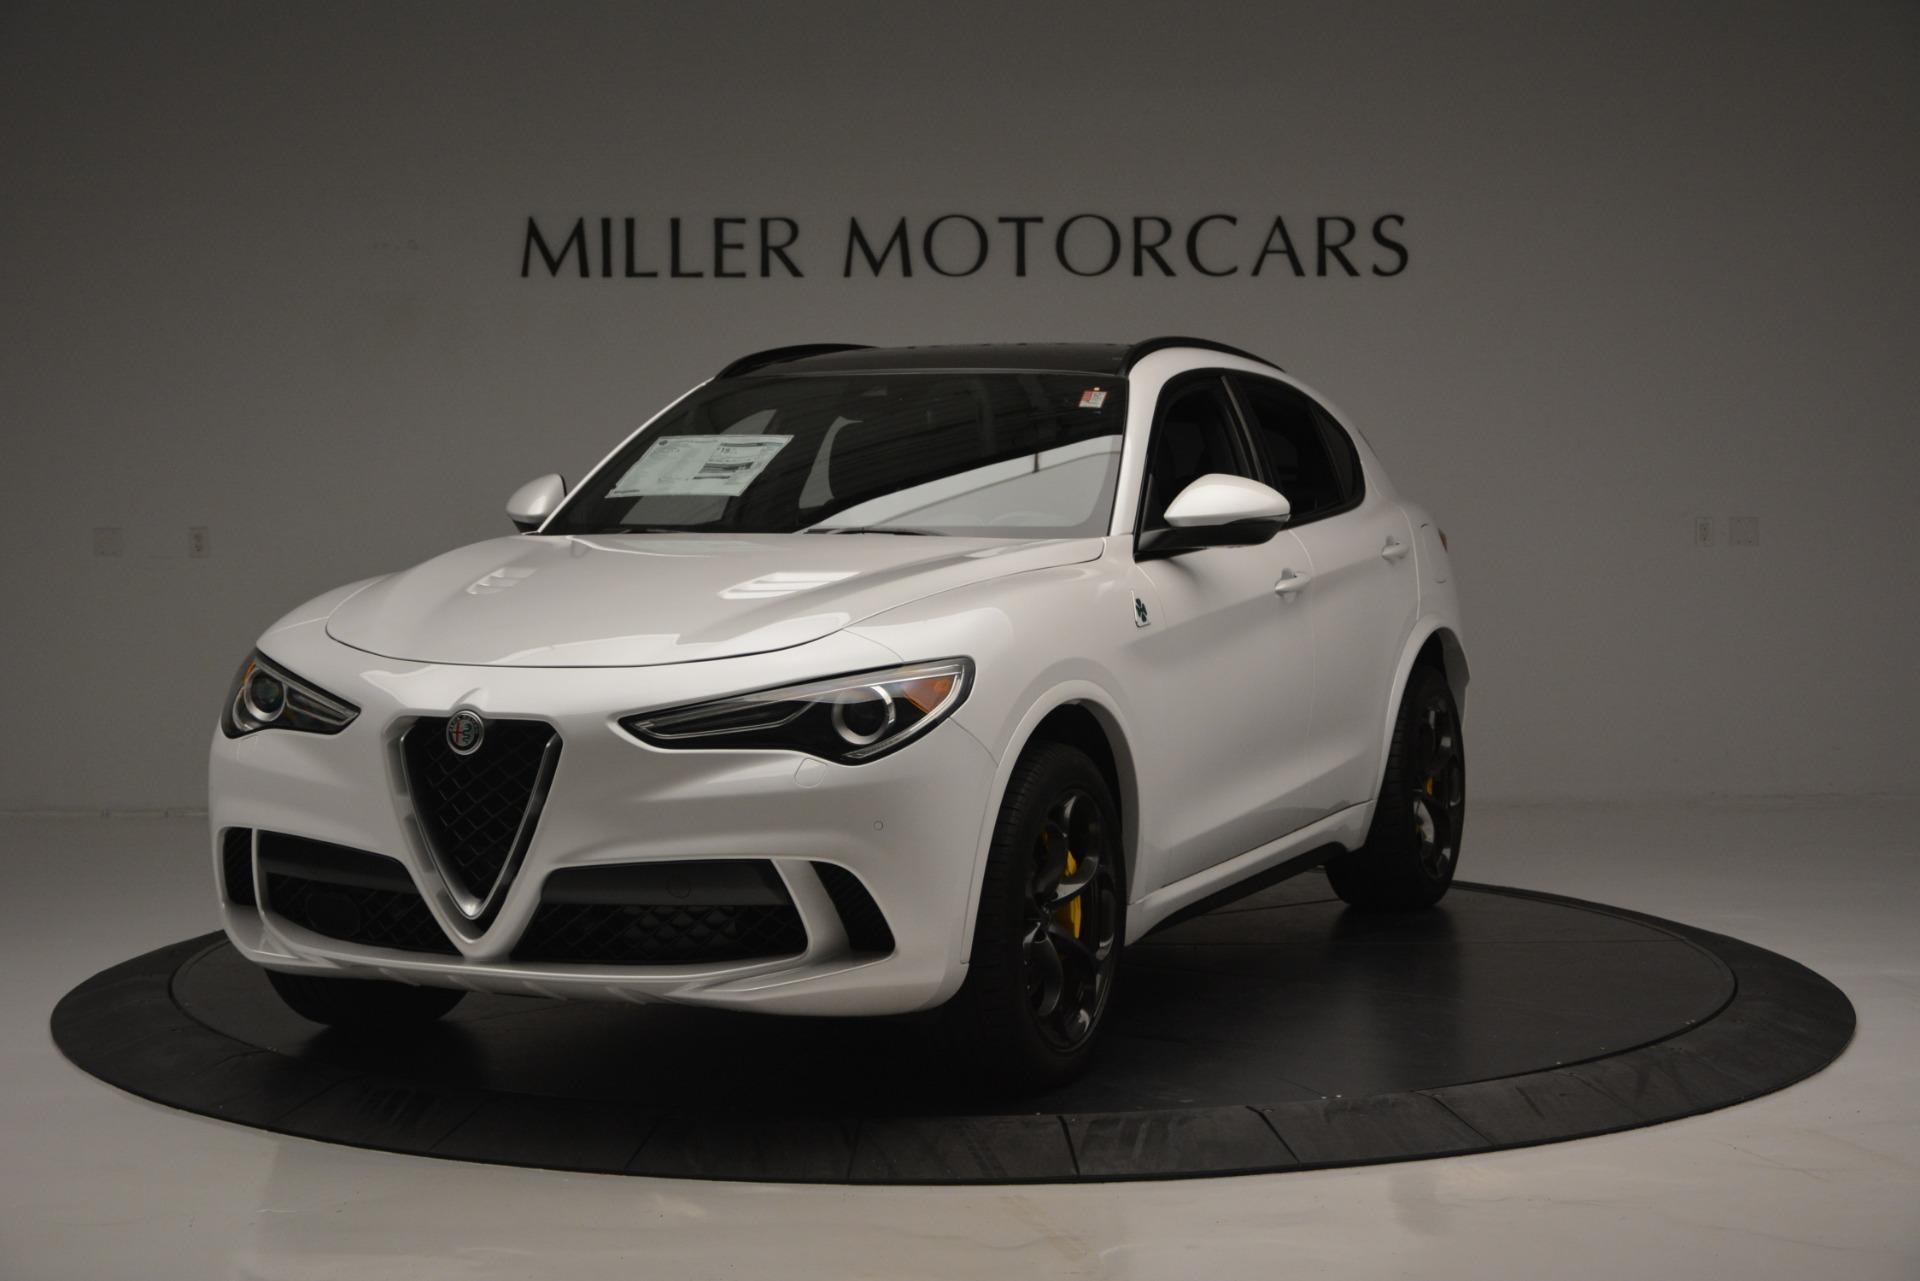 New-2018-Alfa-Romeo-Stelvio-Quadrifoglio-Quadrifoglio